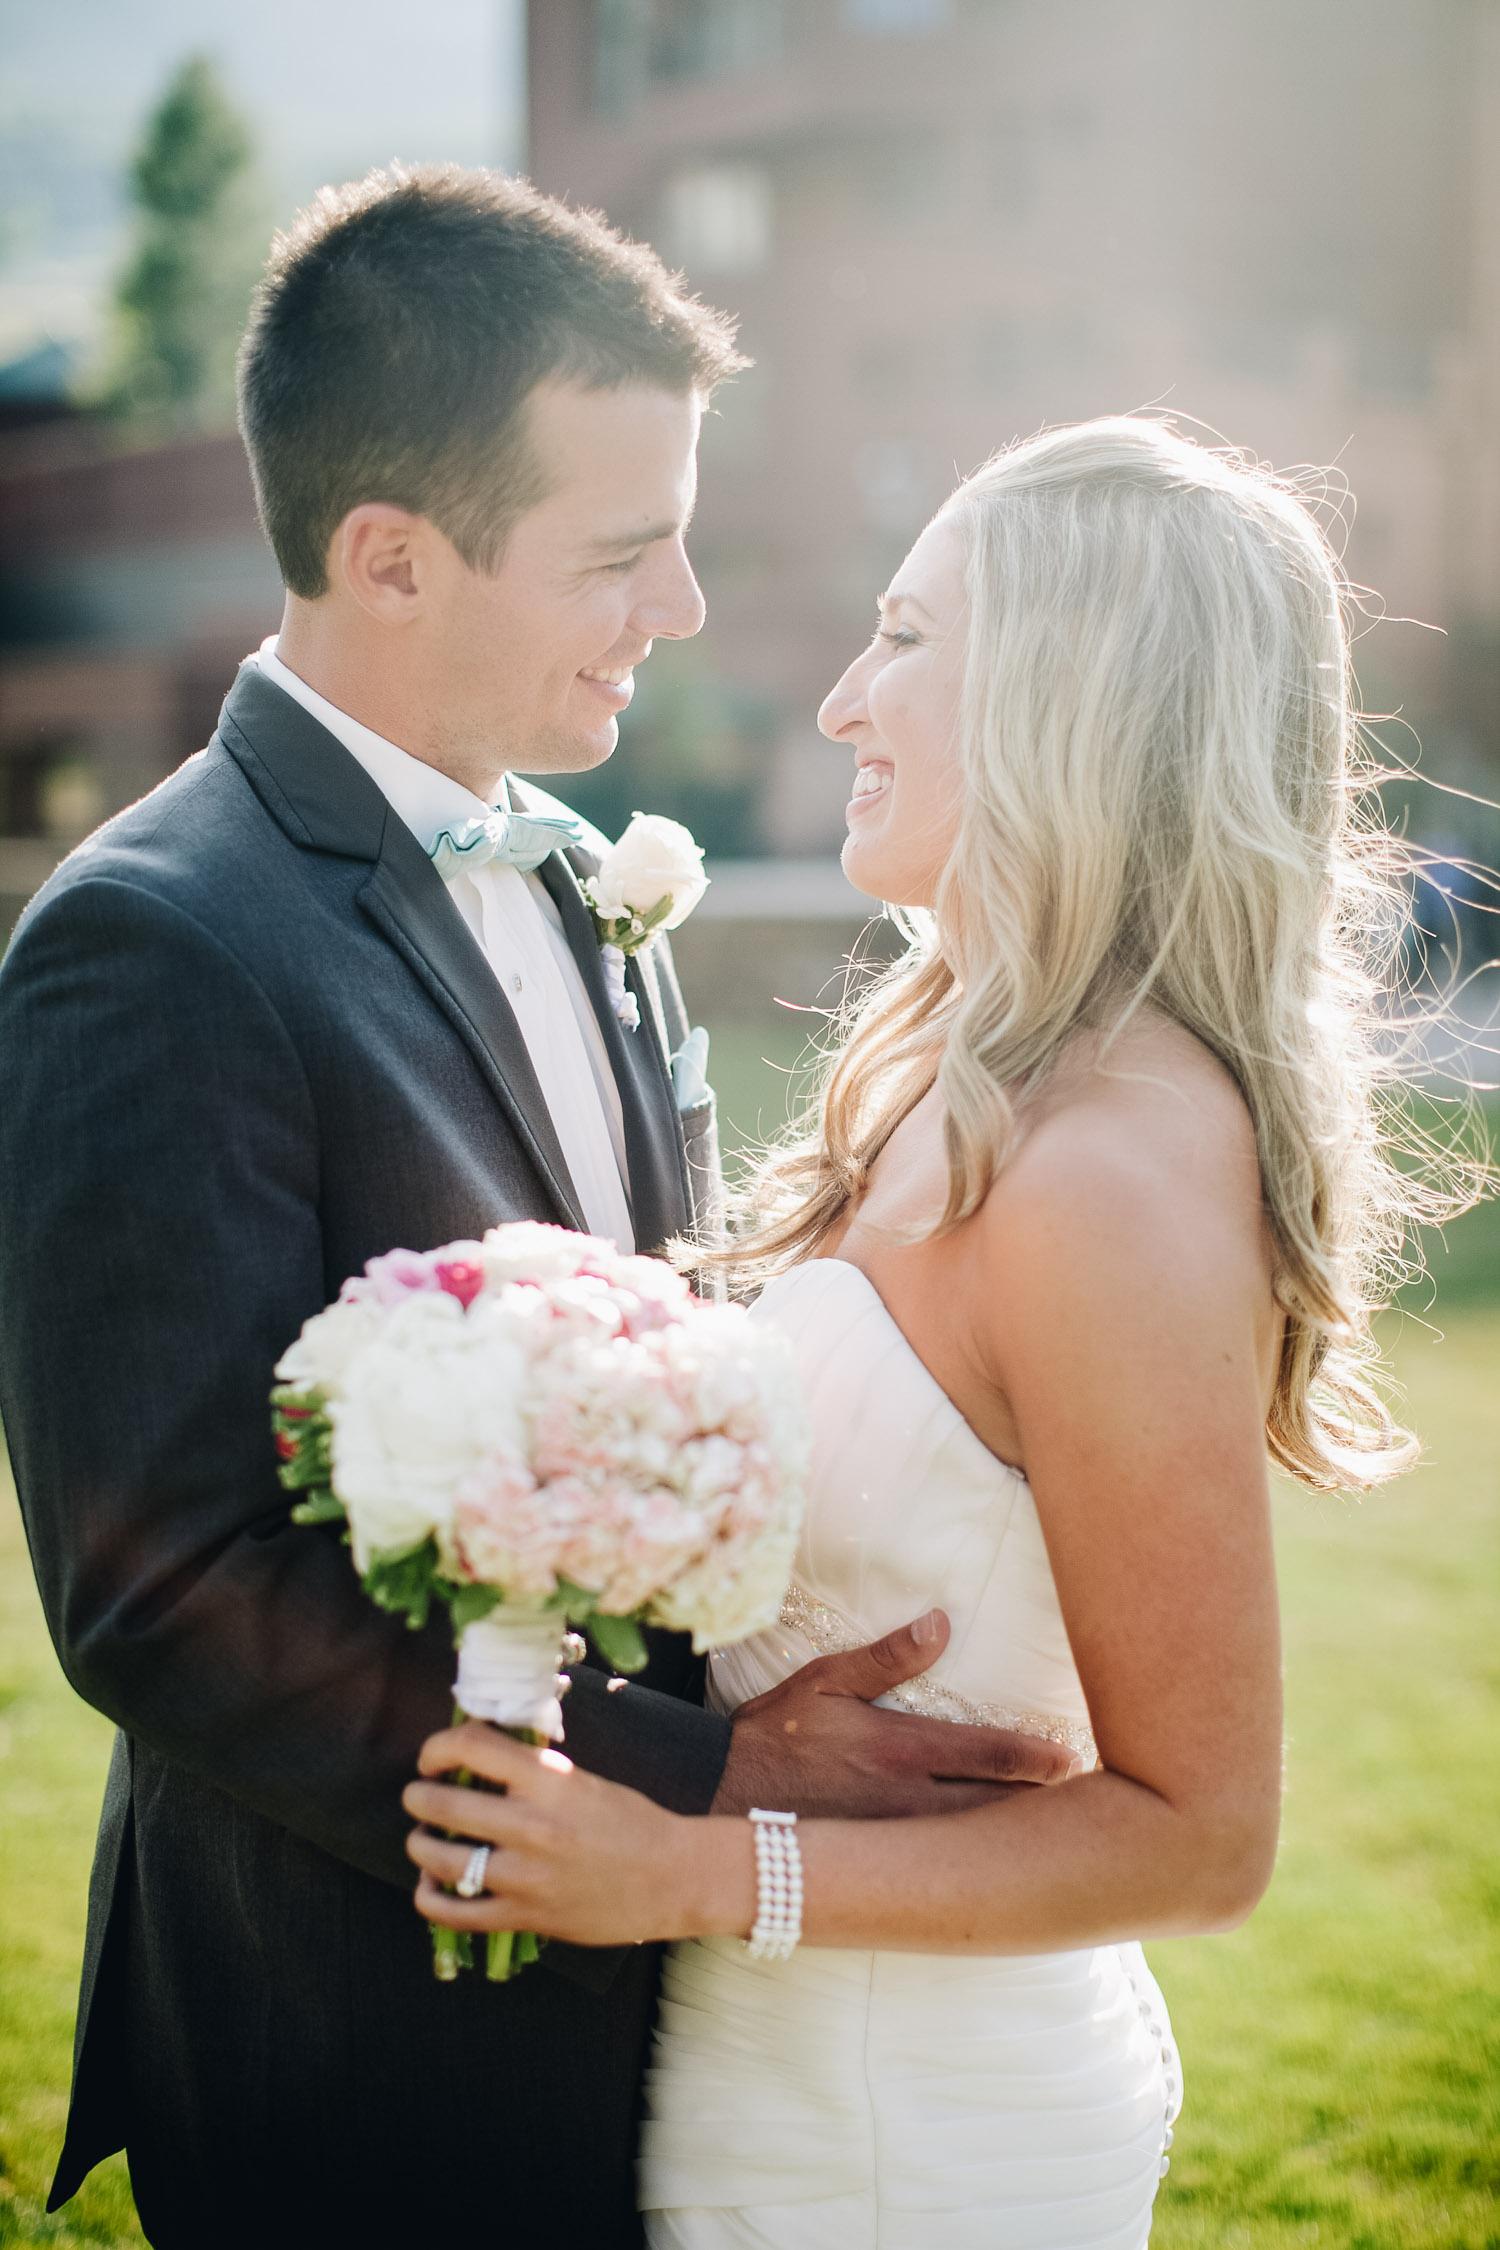 JMPHOTOART-Wedding-Photographer-149.jpg